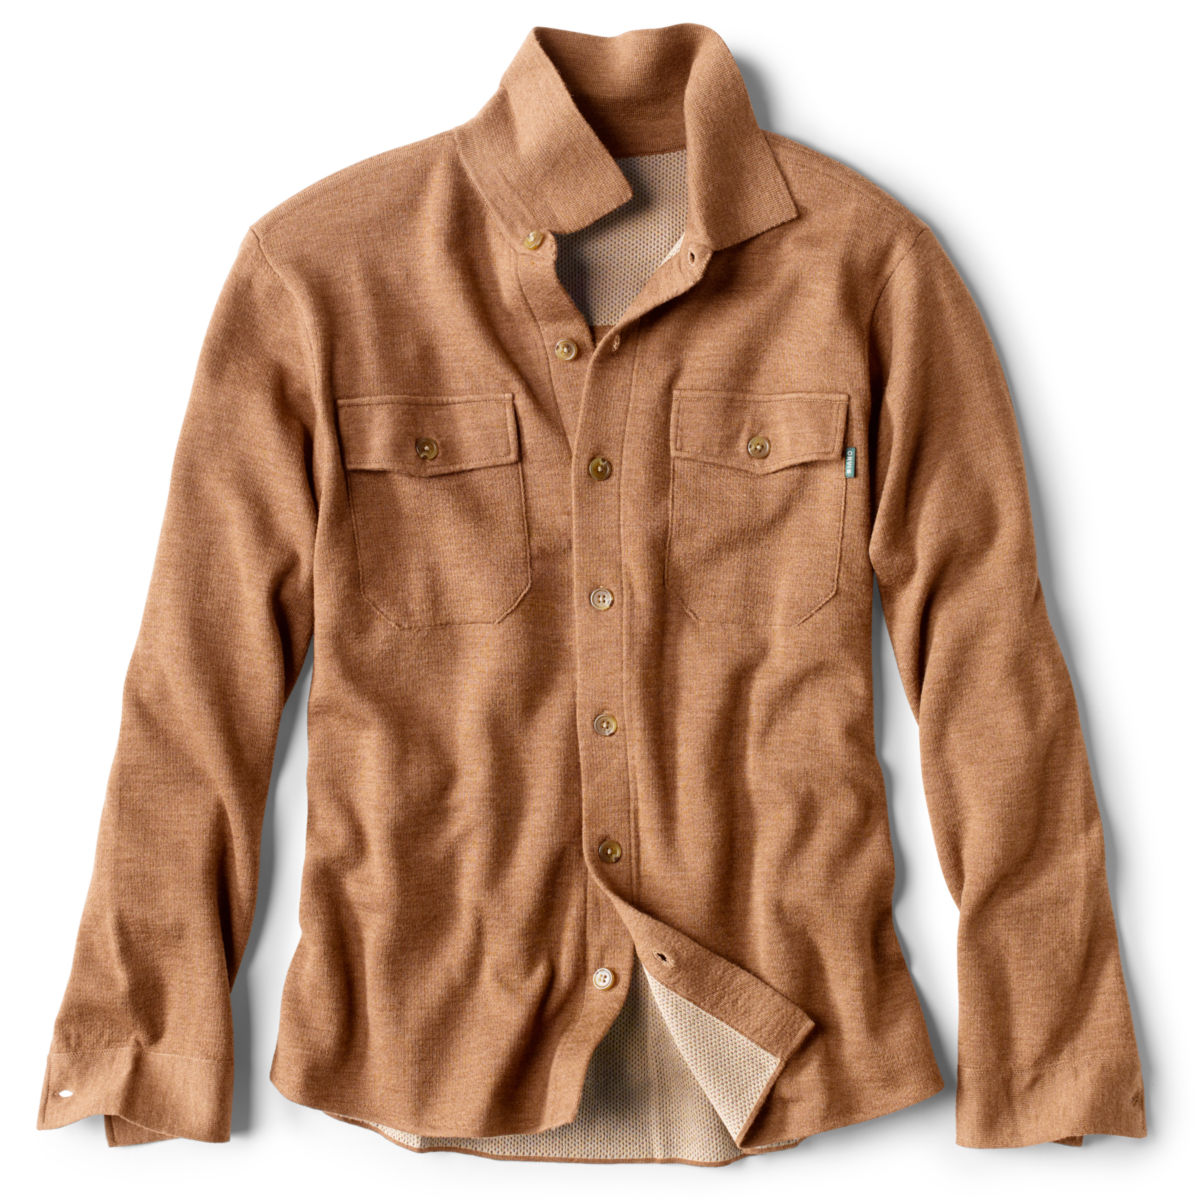 Doubleface Sweater Shirt-Jacket - VICUNAimage number 0